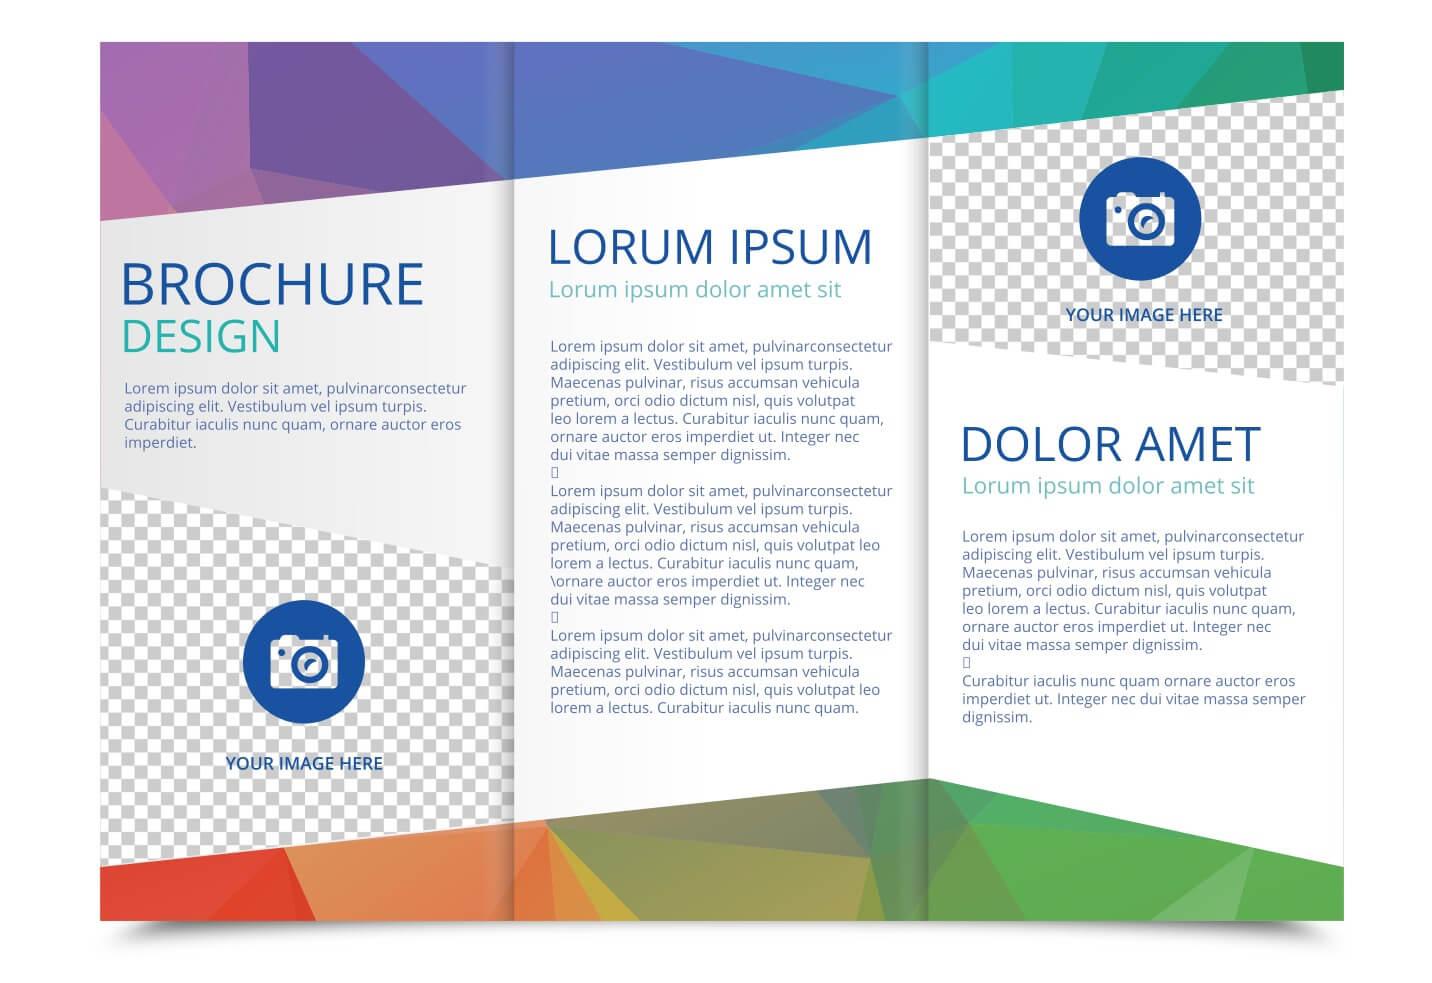 Tri Fold Brochure Vector Template - Download Free Vectors For 3 Fold Brochure Template Free